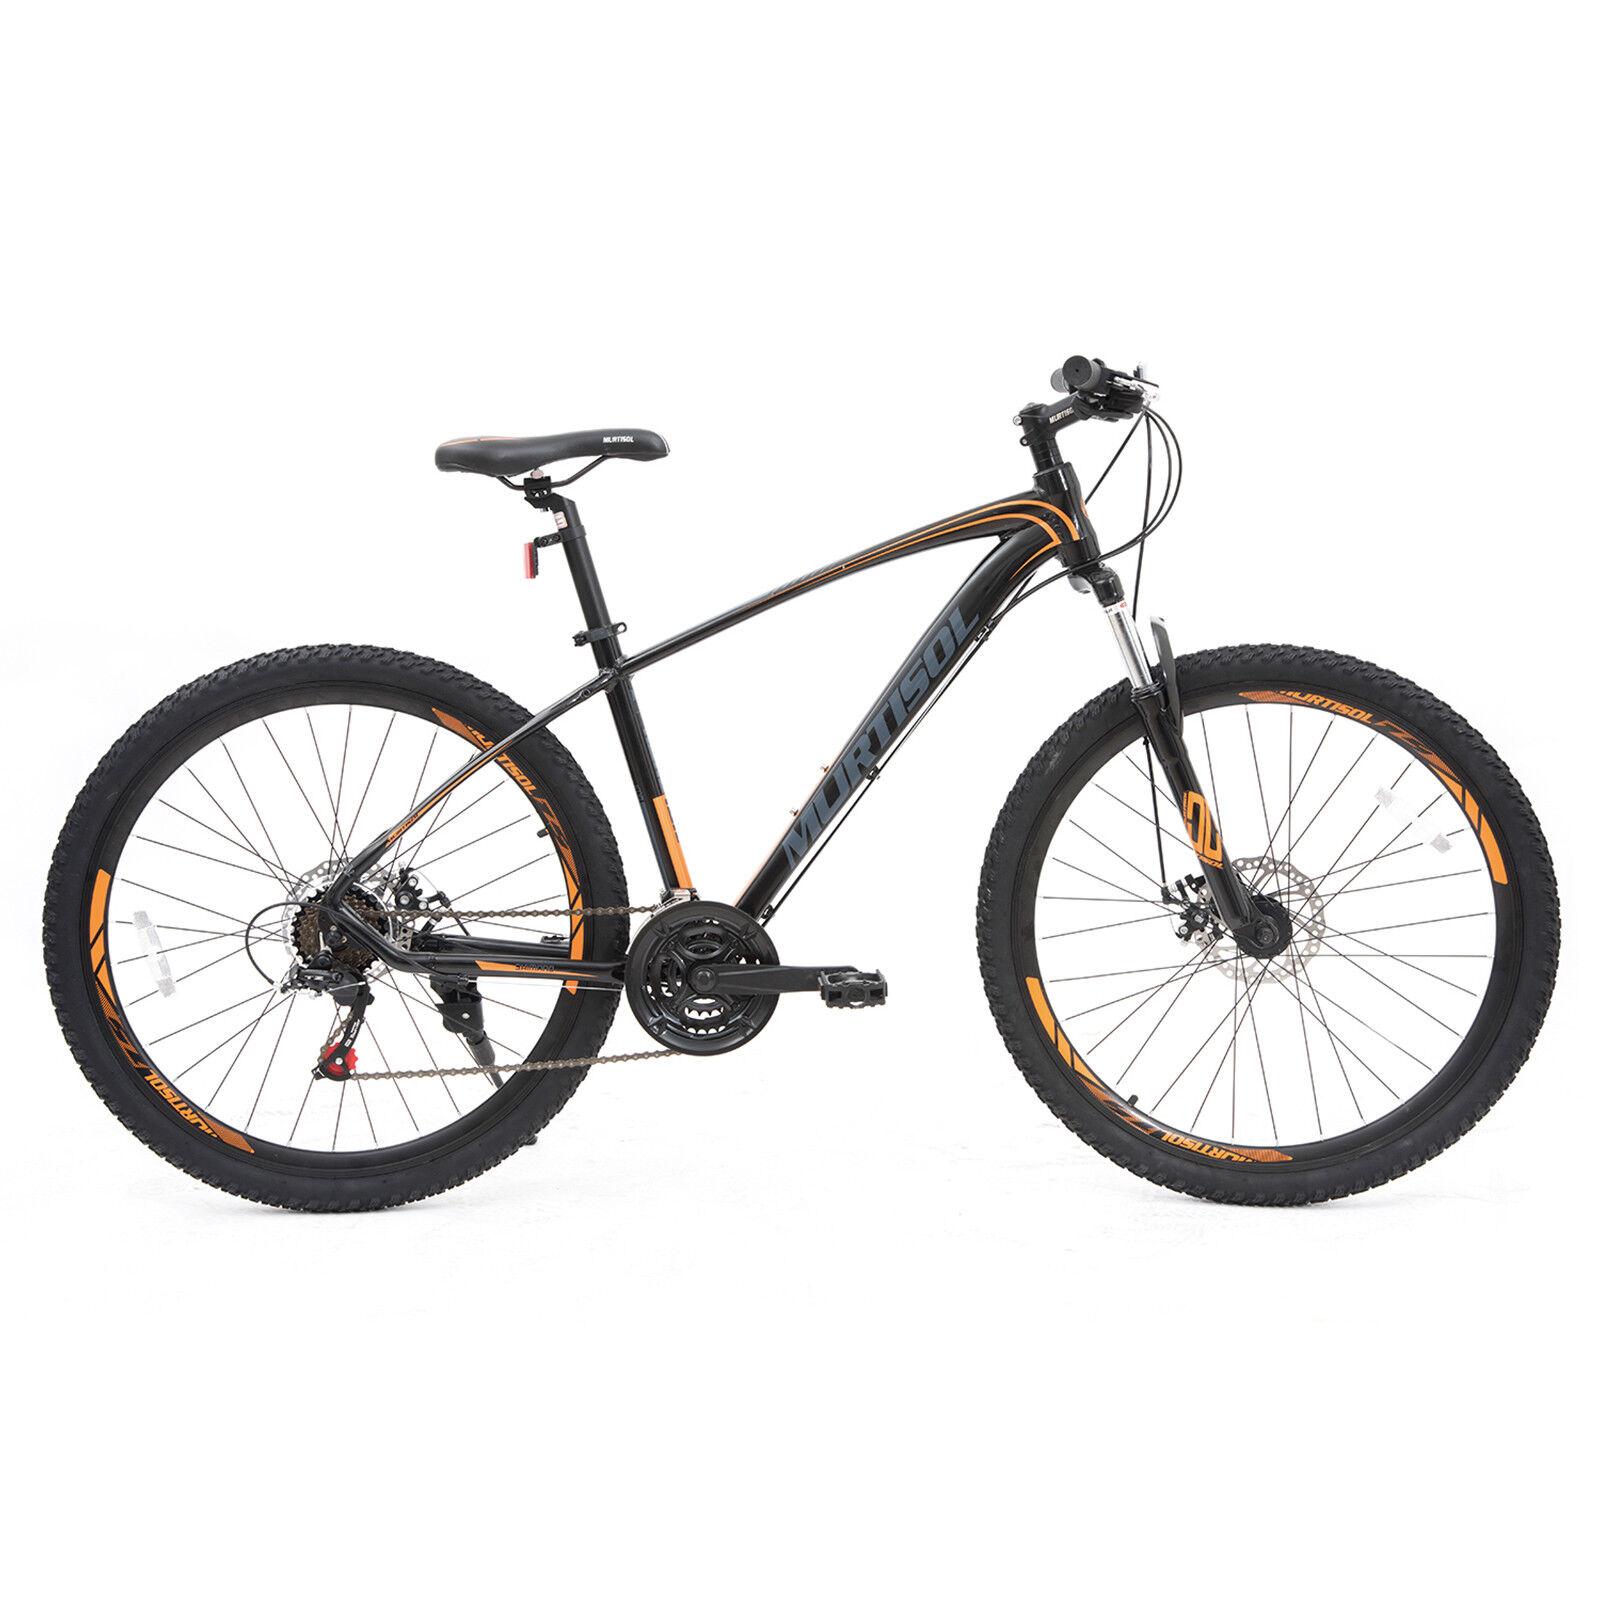 27.5  Aluminum Mountain Bike Front Suspension Bicycle 21 Speed Disc Brake Yellow